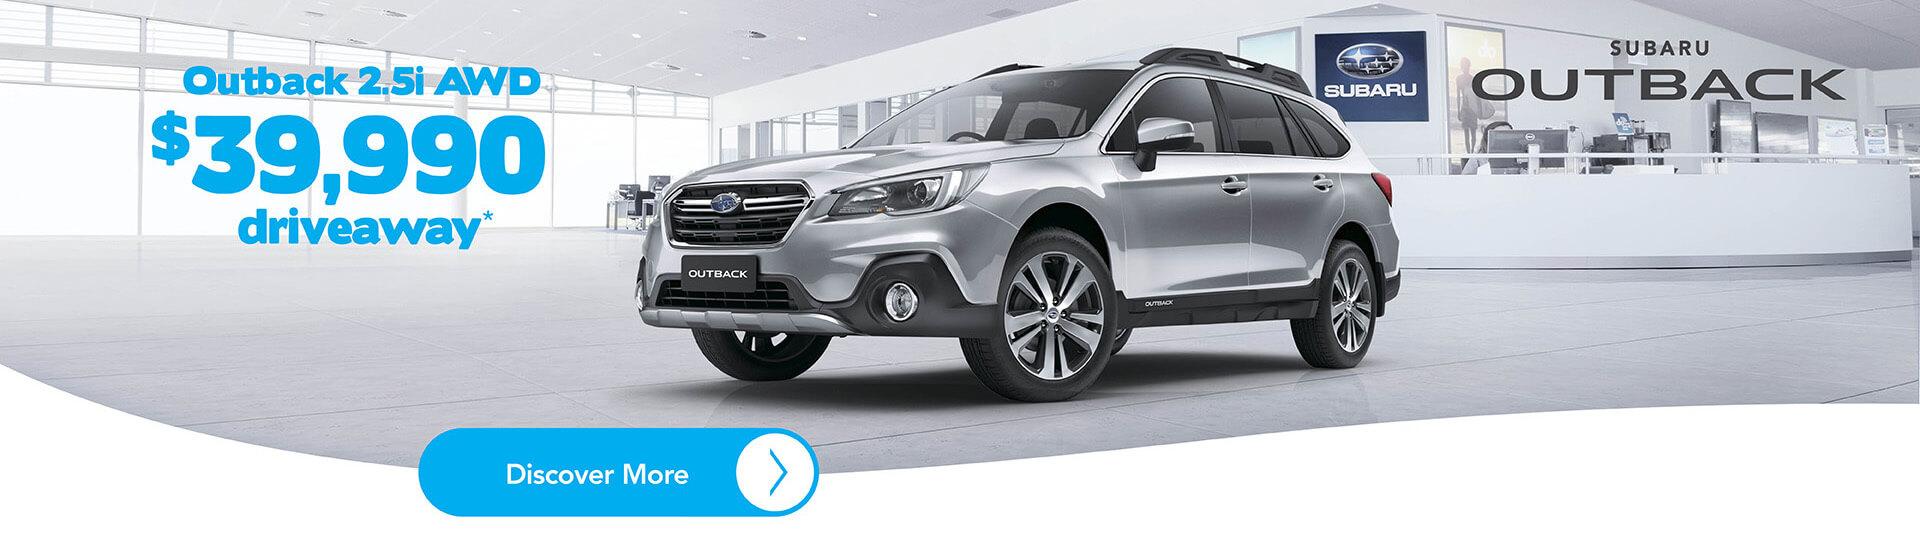 Subaru Offer - Feb 2019 - Outback